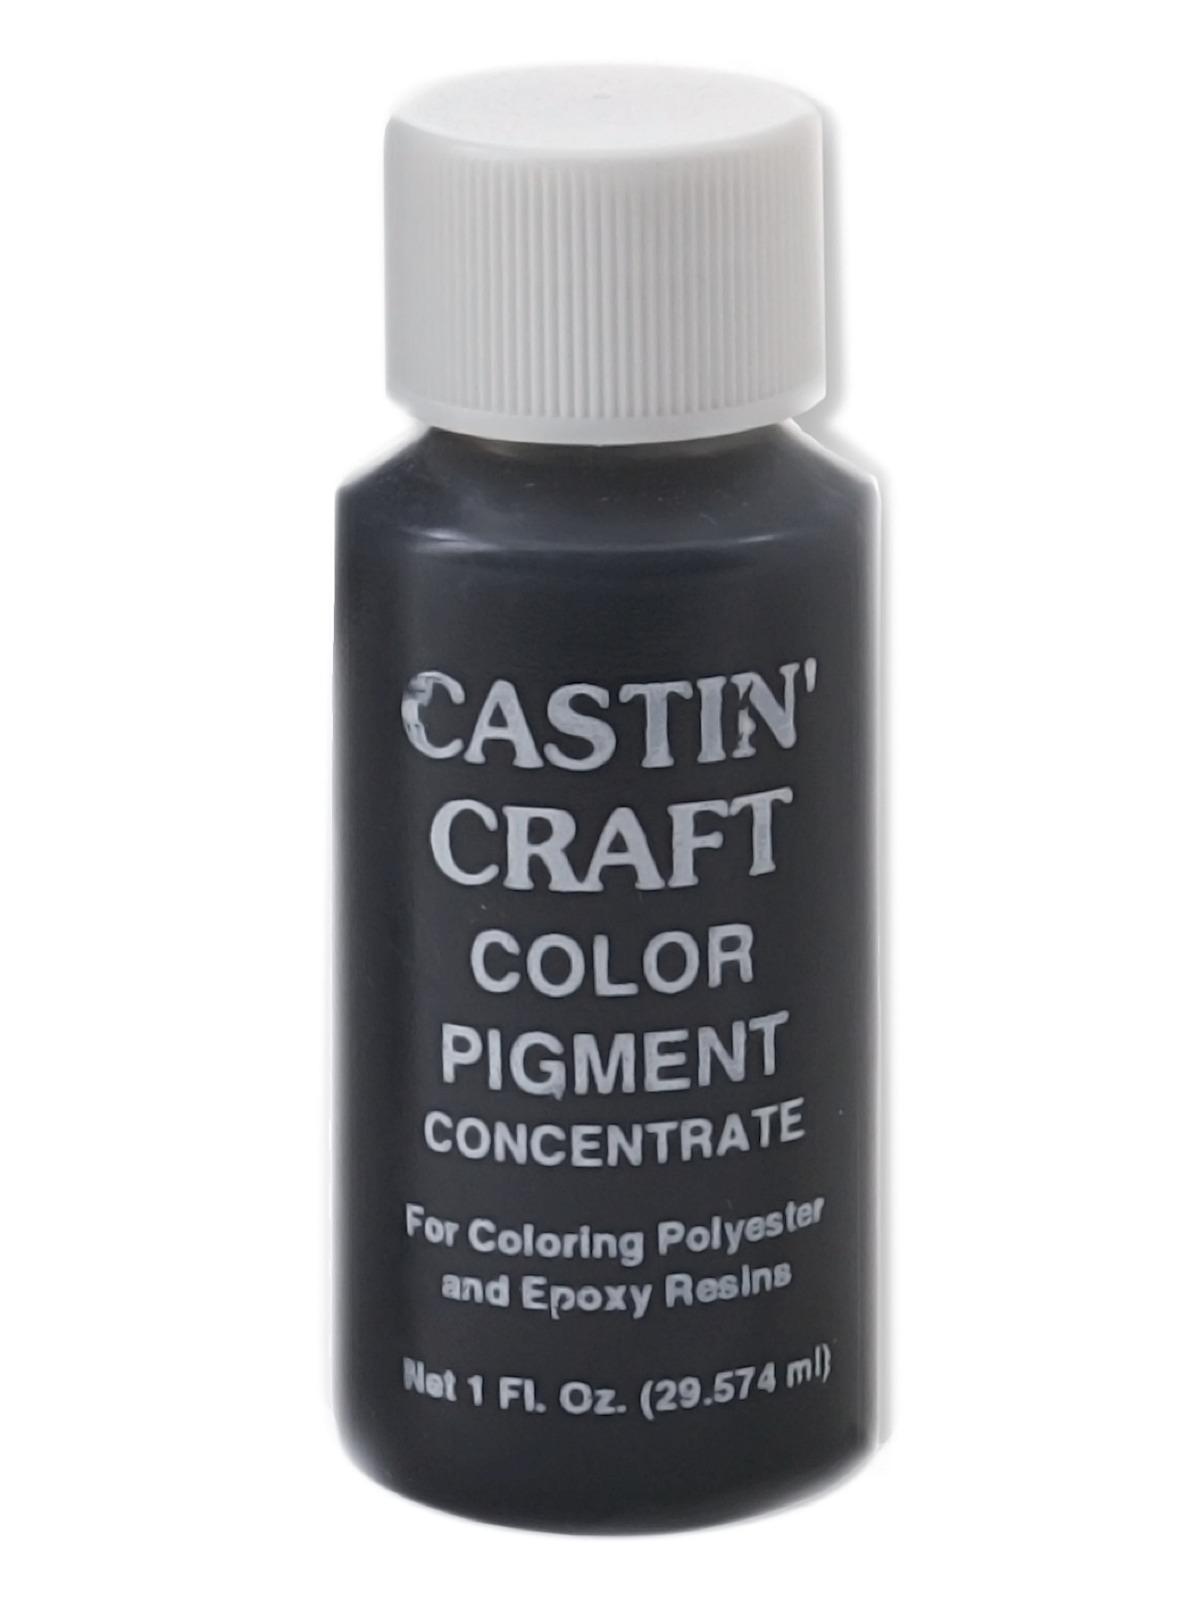 Castin craft color pigment - Castin Craft Color Pigment 10